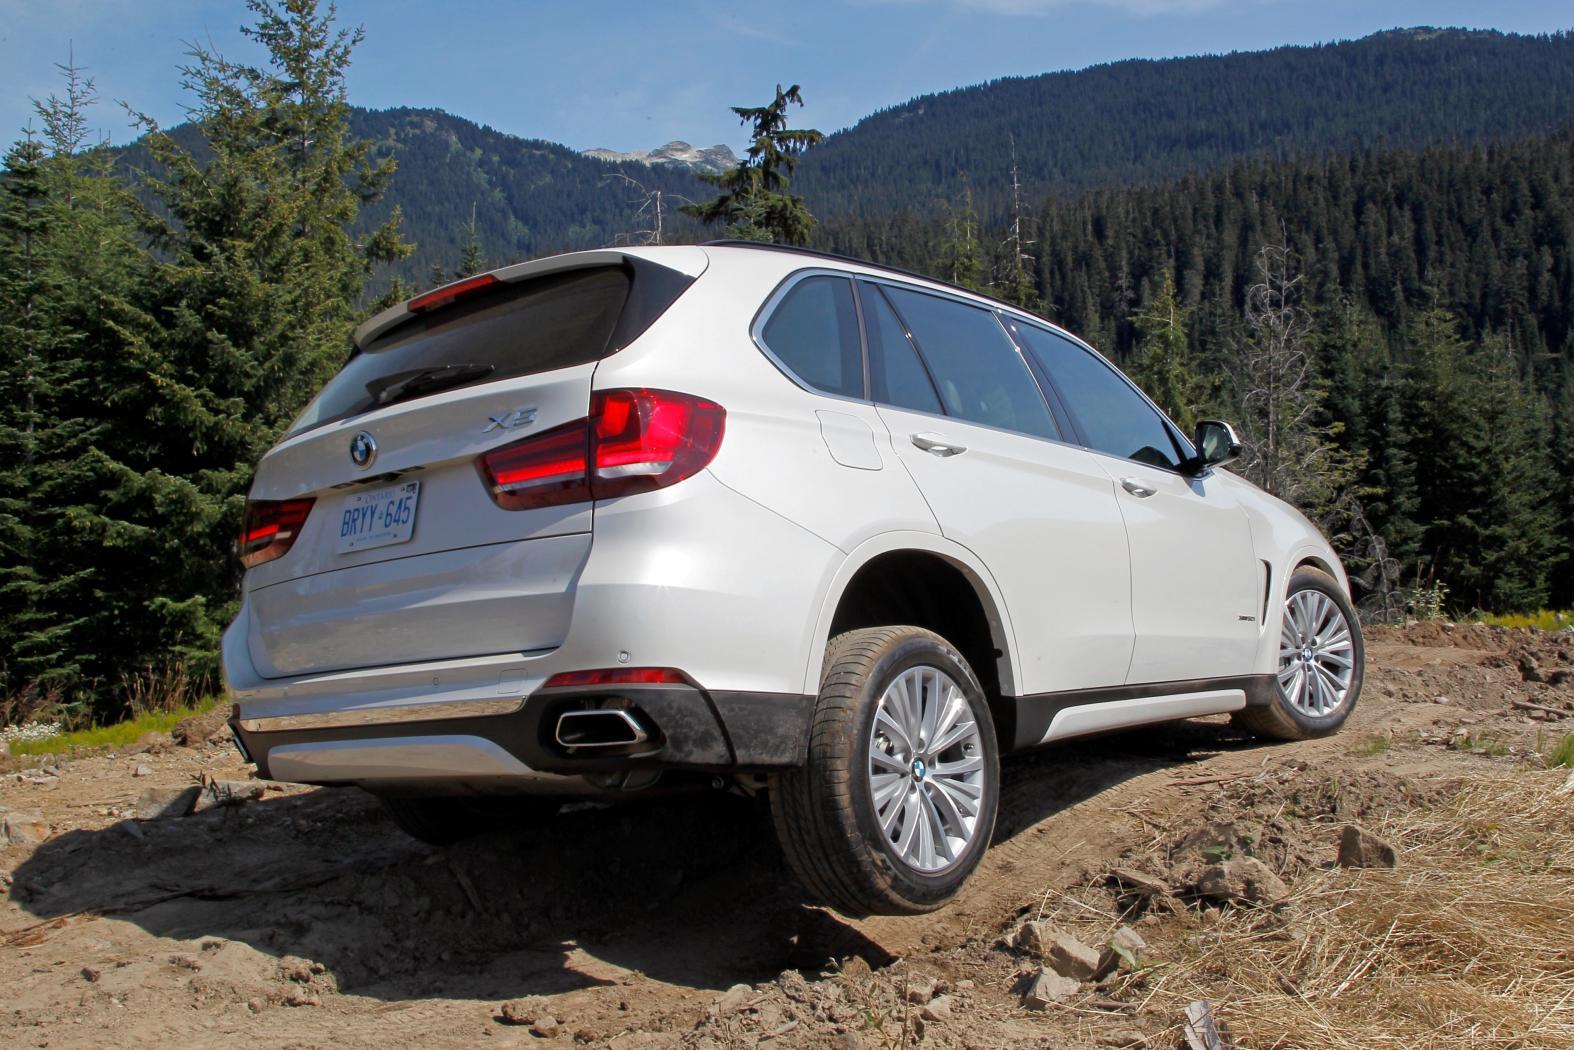 BMW-X5-blanche.jpeg